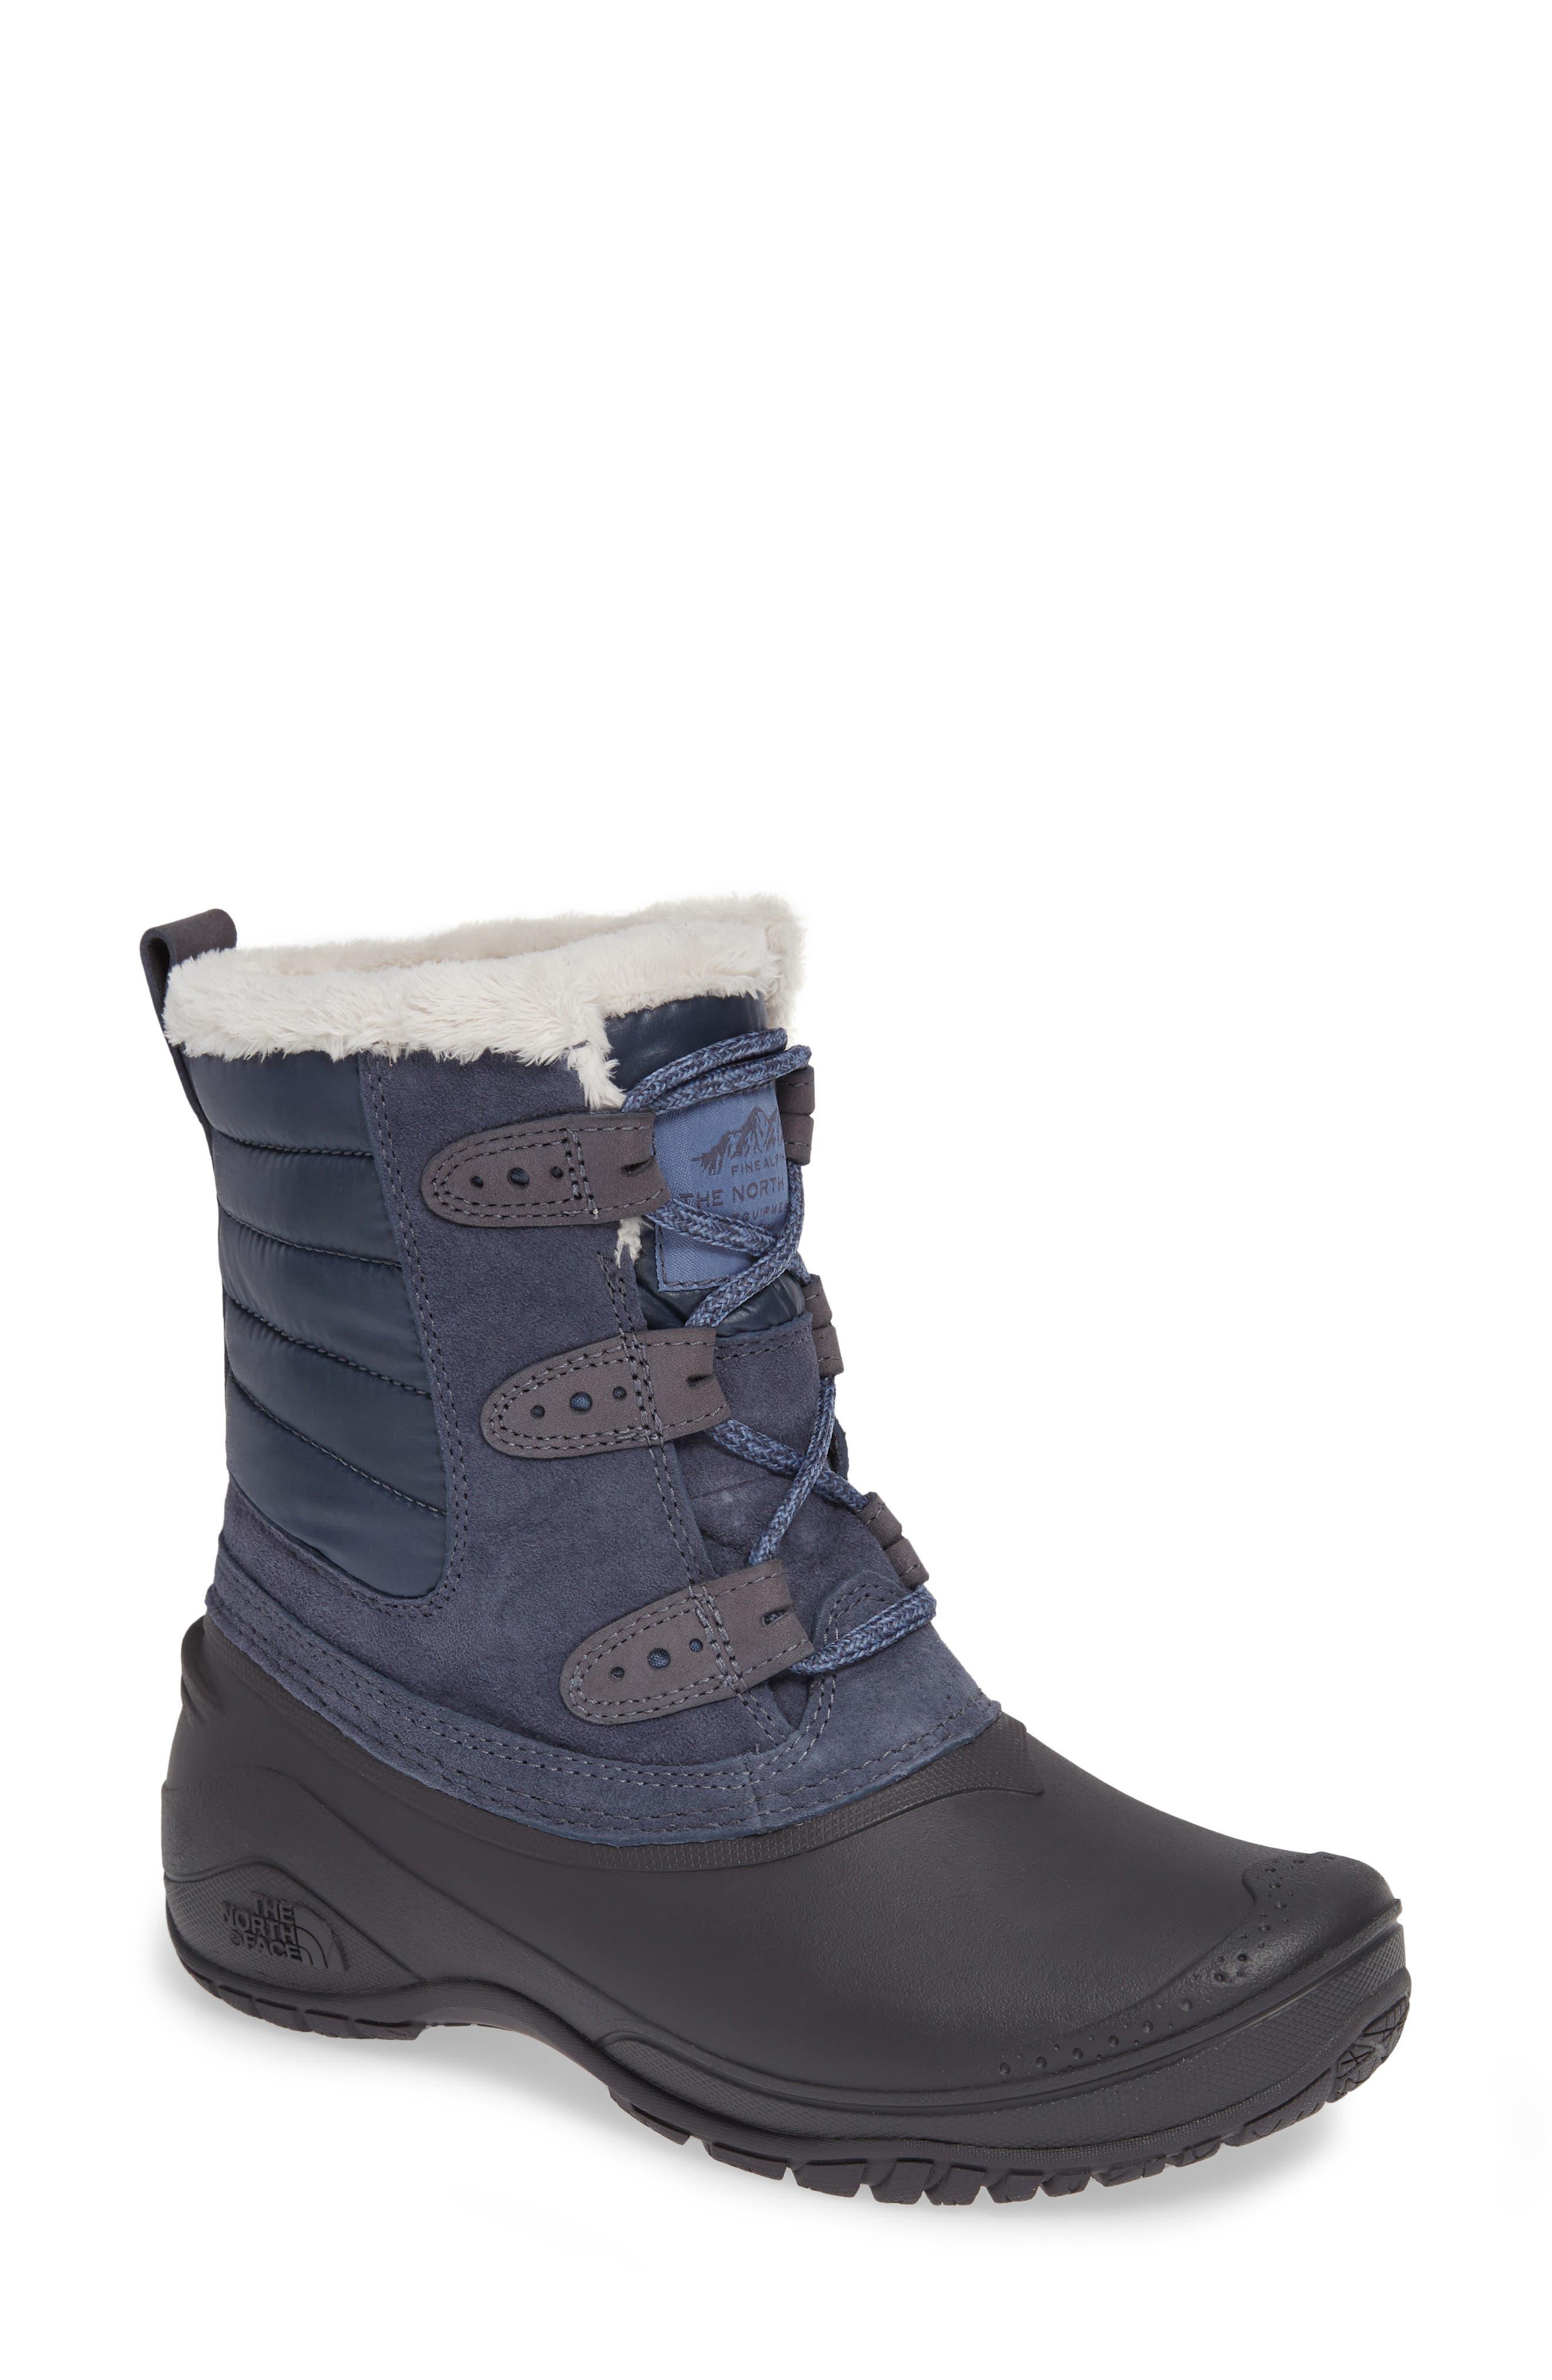 Shellista II Waterproof Boot,                             Main thumbnail 2, color,